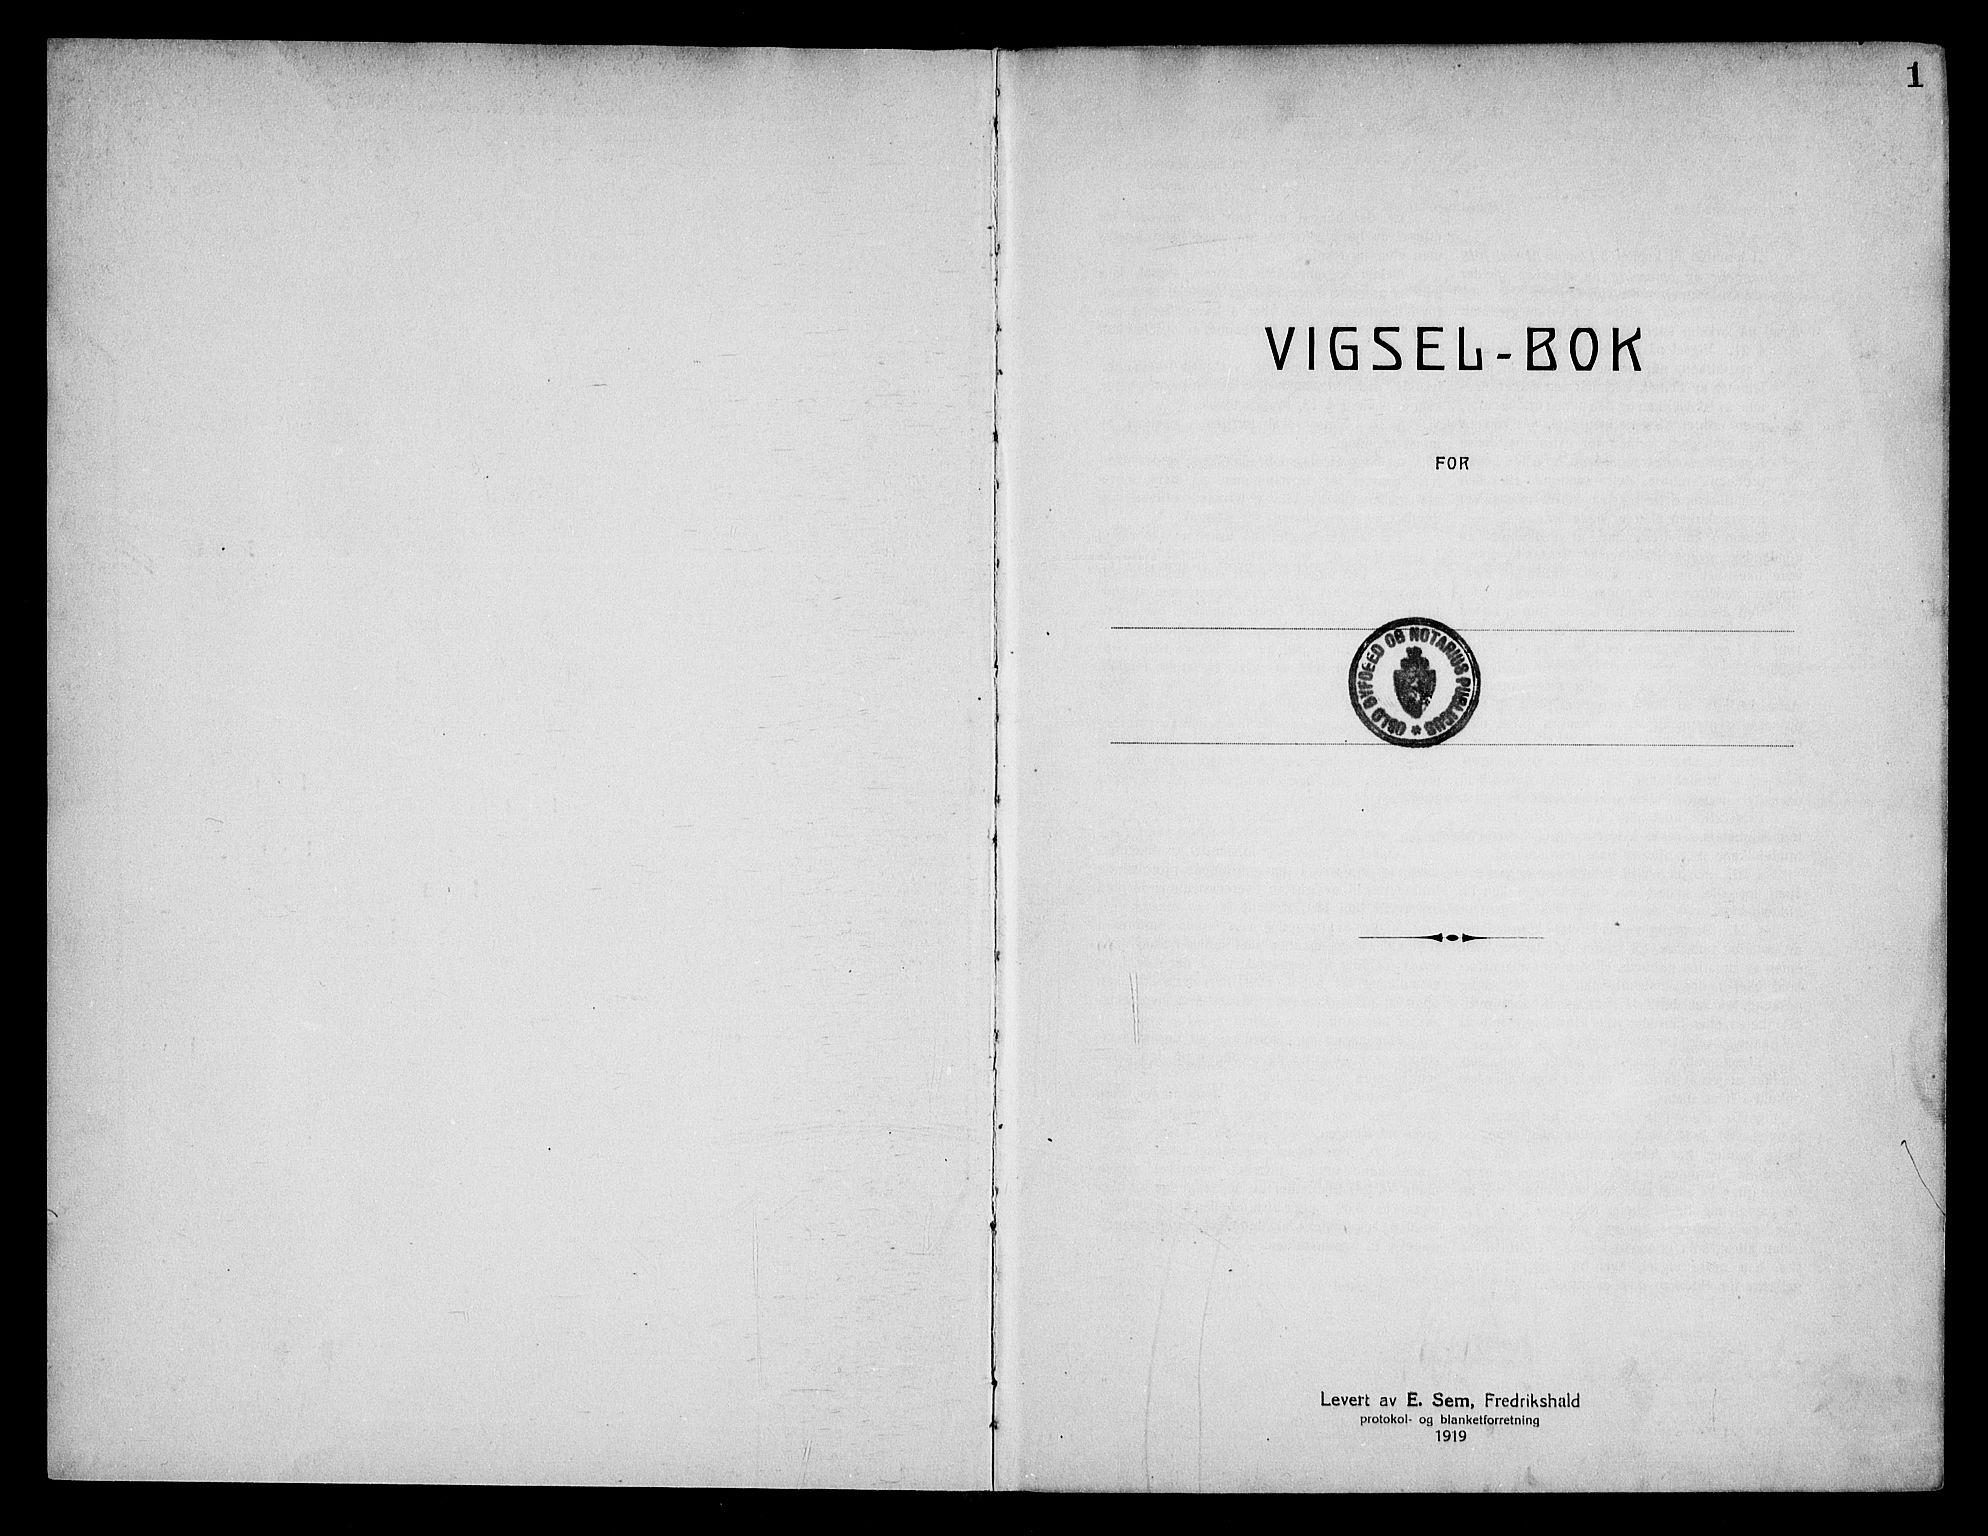 SAO, Oslo byfogd avd. I, L/Lb/Lbb/L0018: Notarialprotokoll, rekke II: Vigsler, 1926-1928, s. 1a